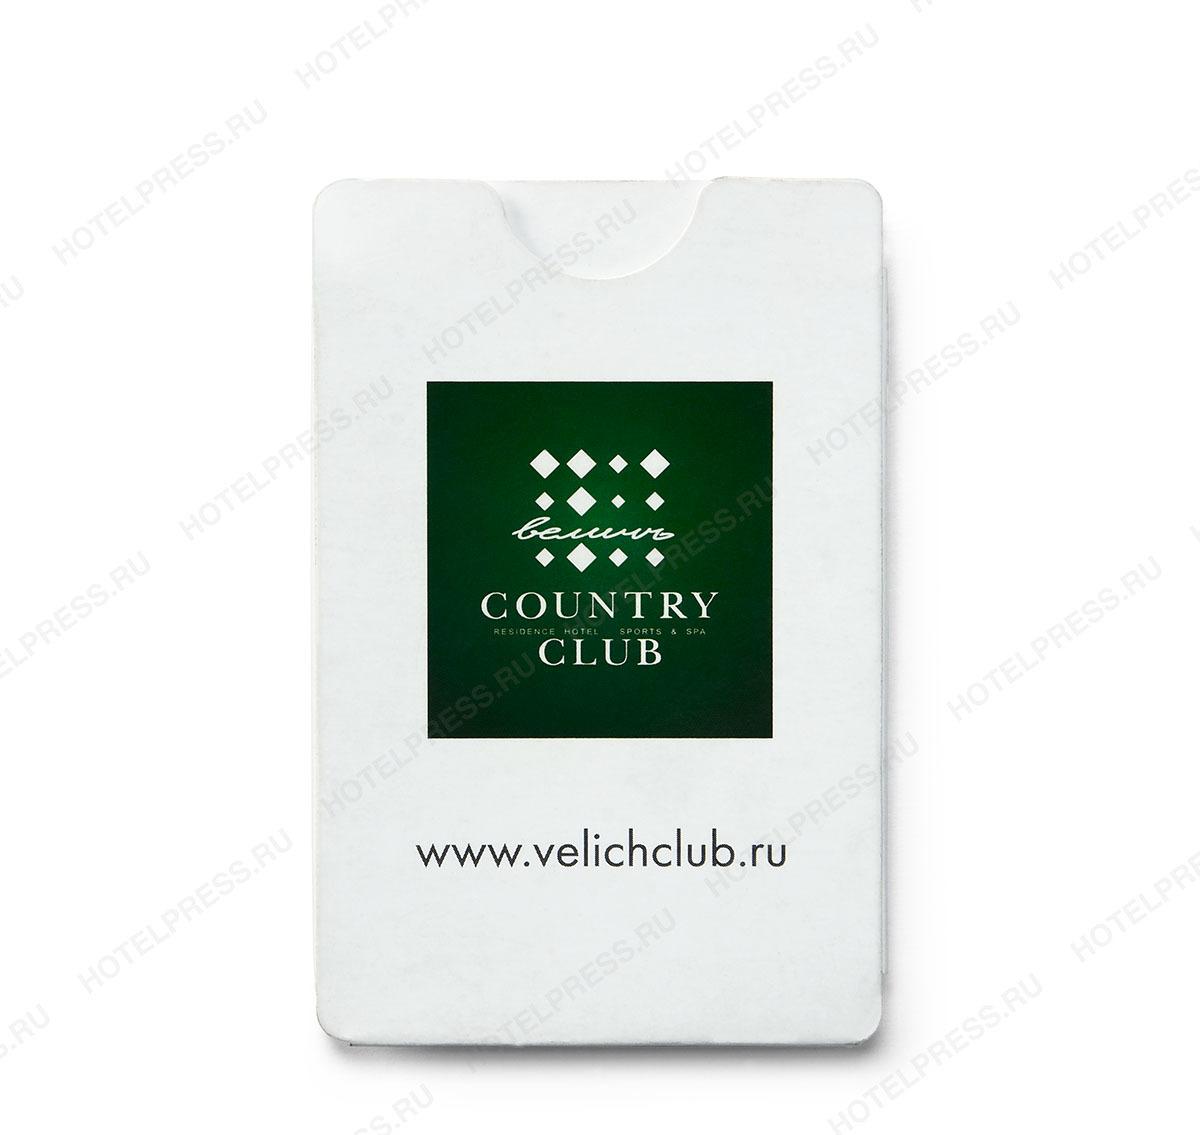 Z-card с карманом под ключ-карту.